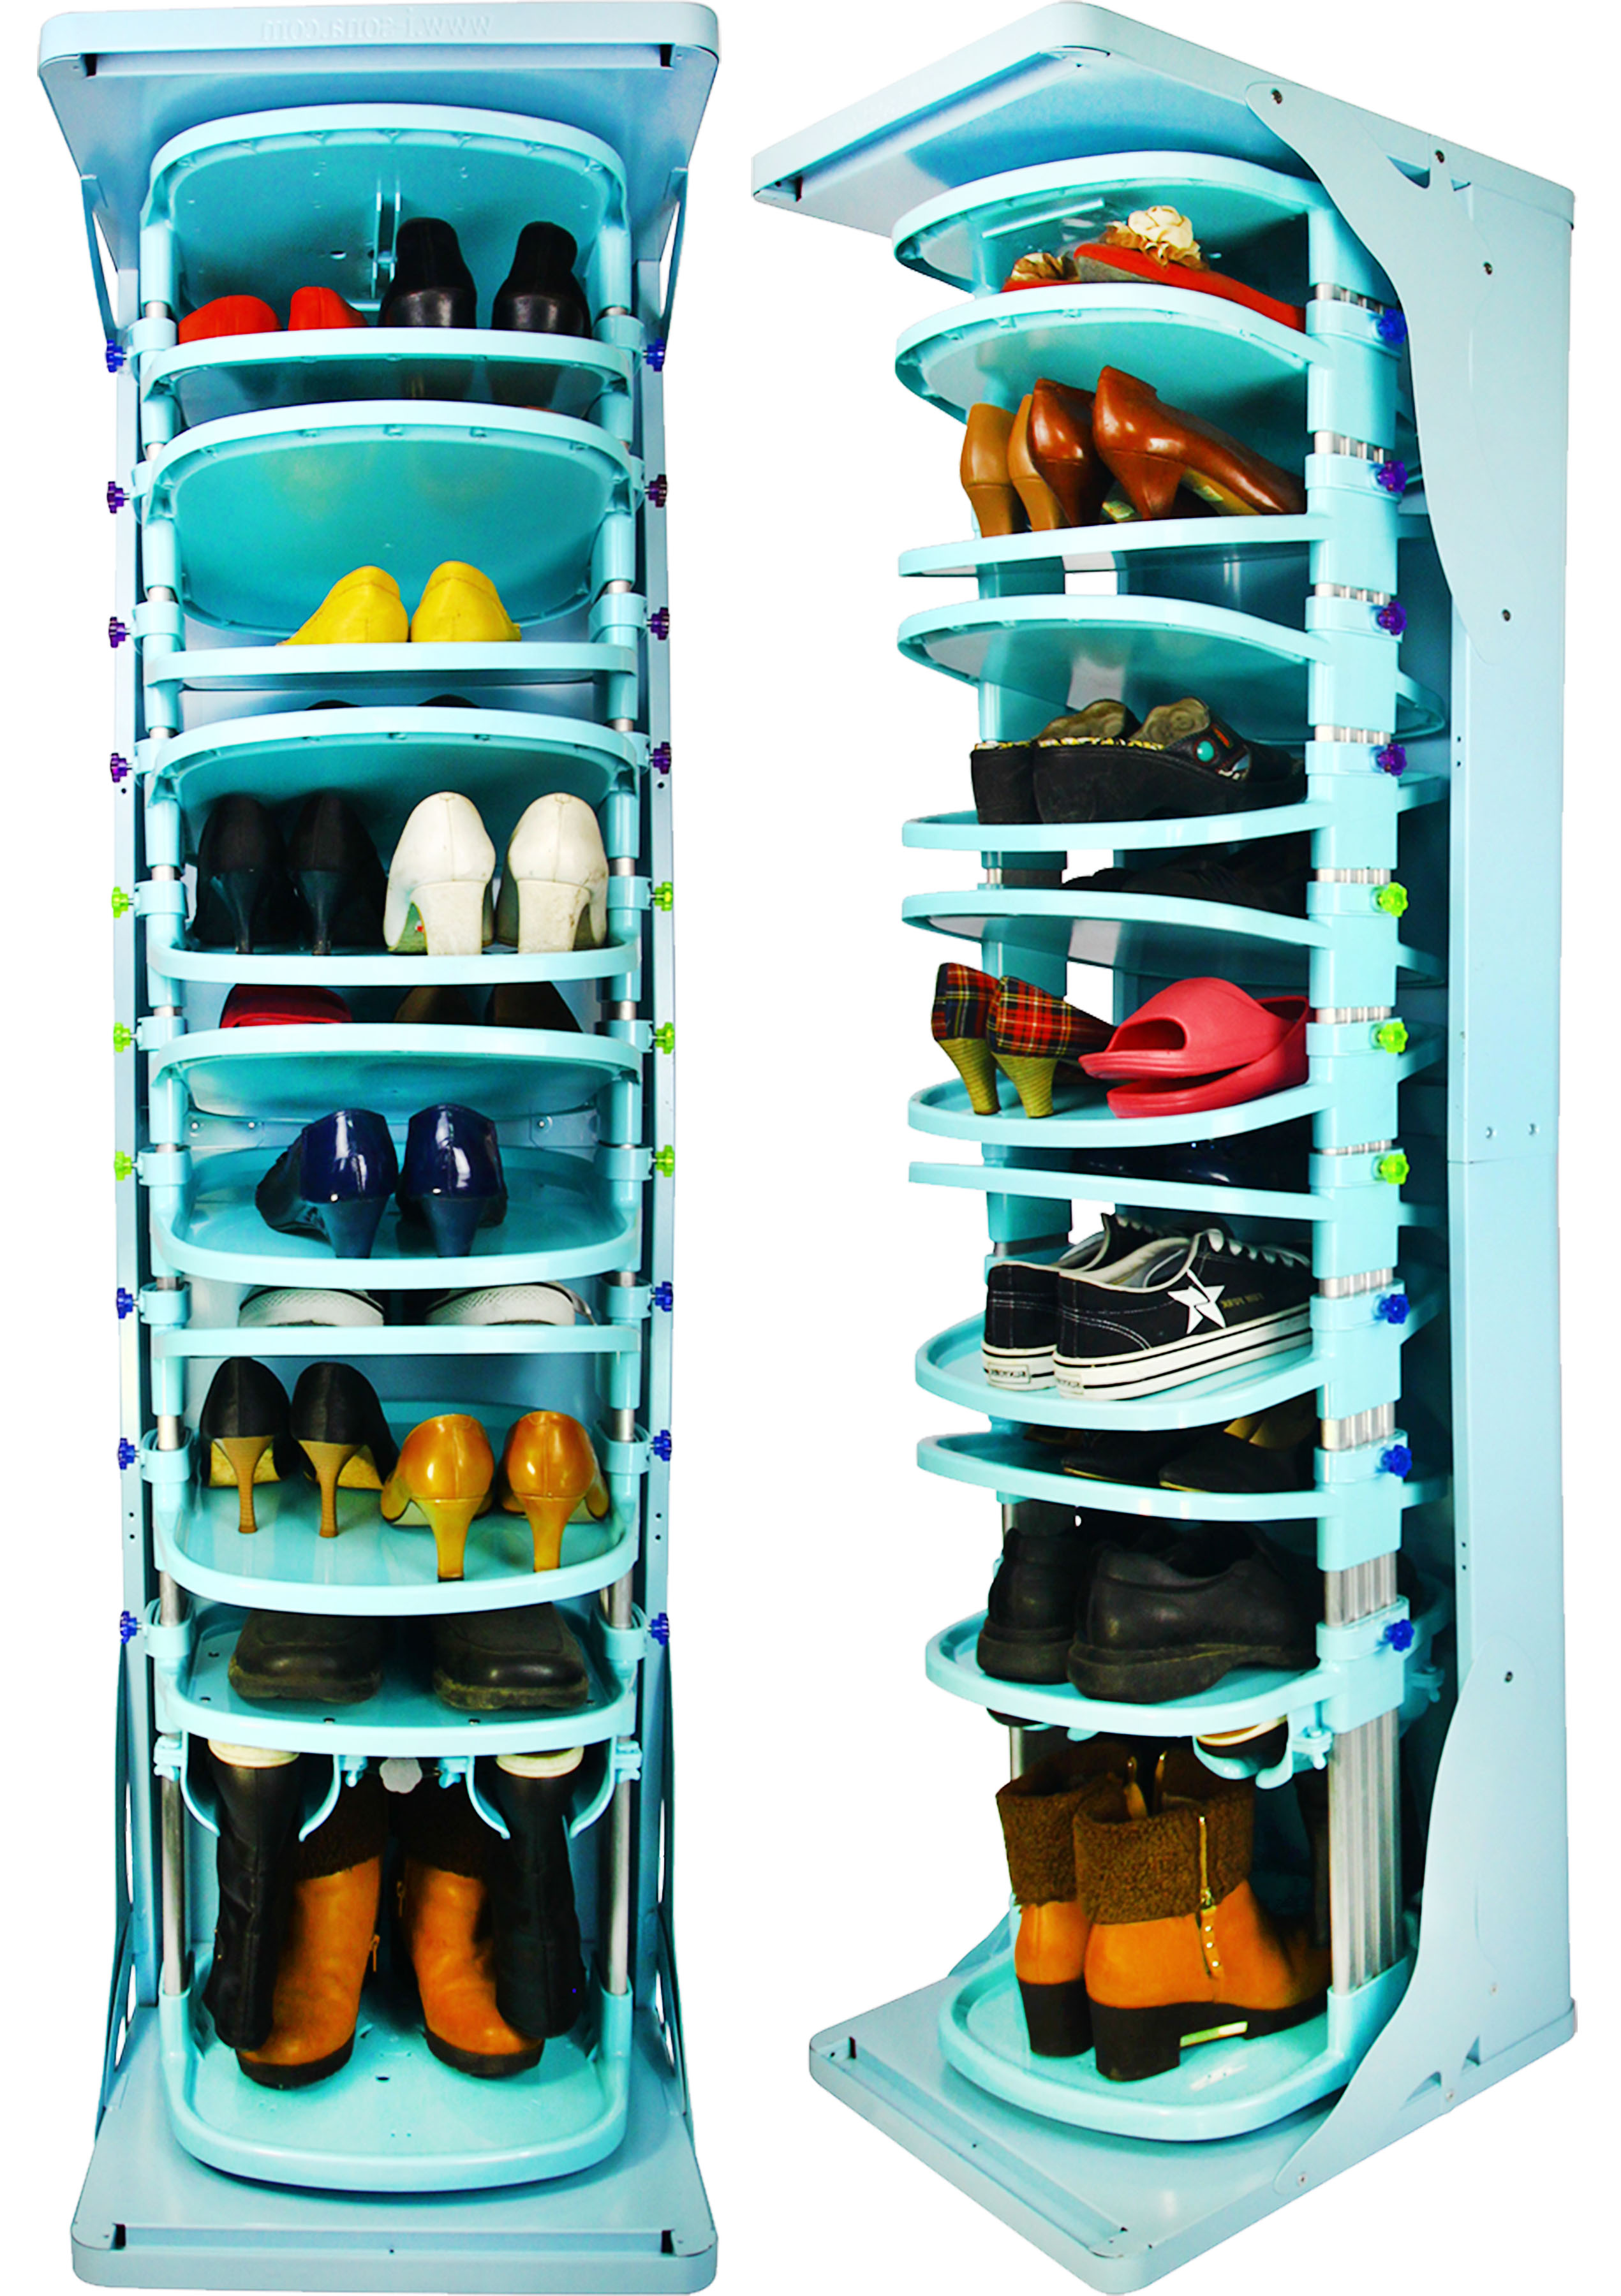 navana revolving chair price in bangladesh egg chairs for sale taiwan free standing adjustable swivel footwear shelf